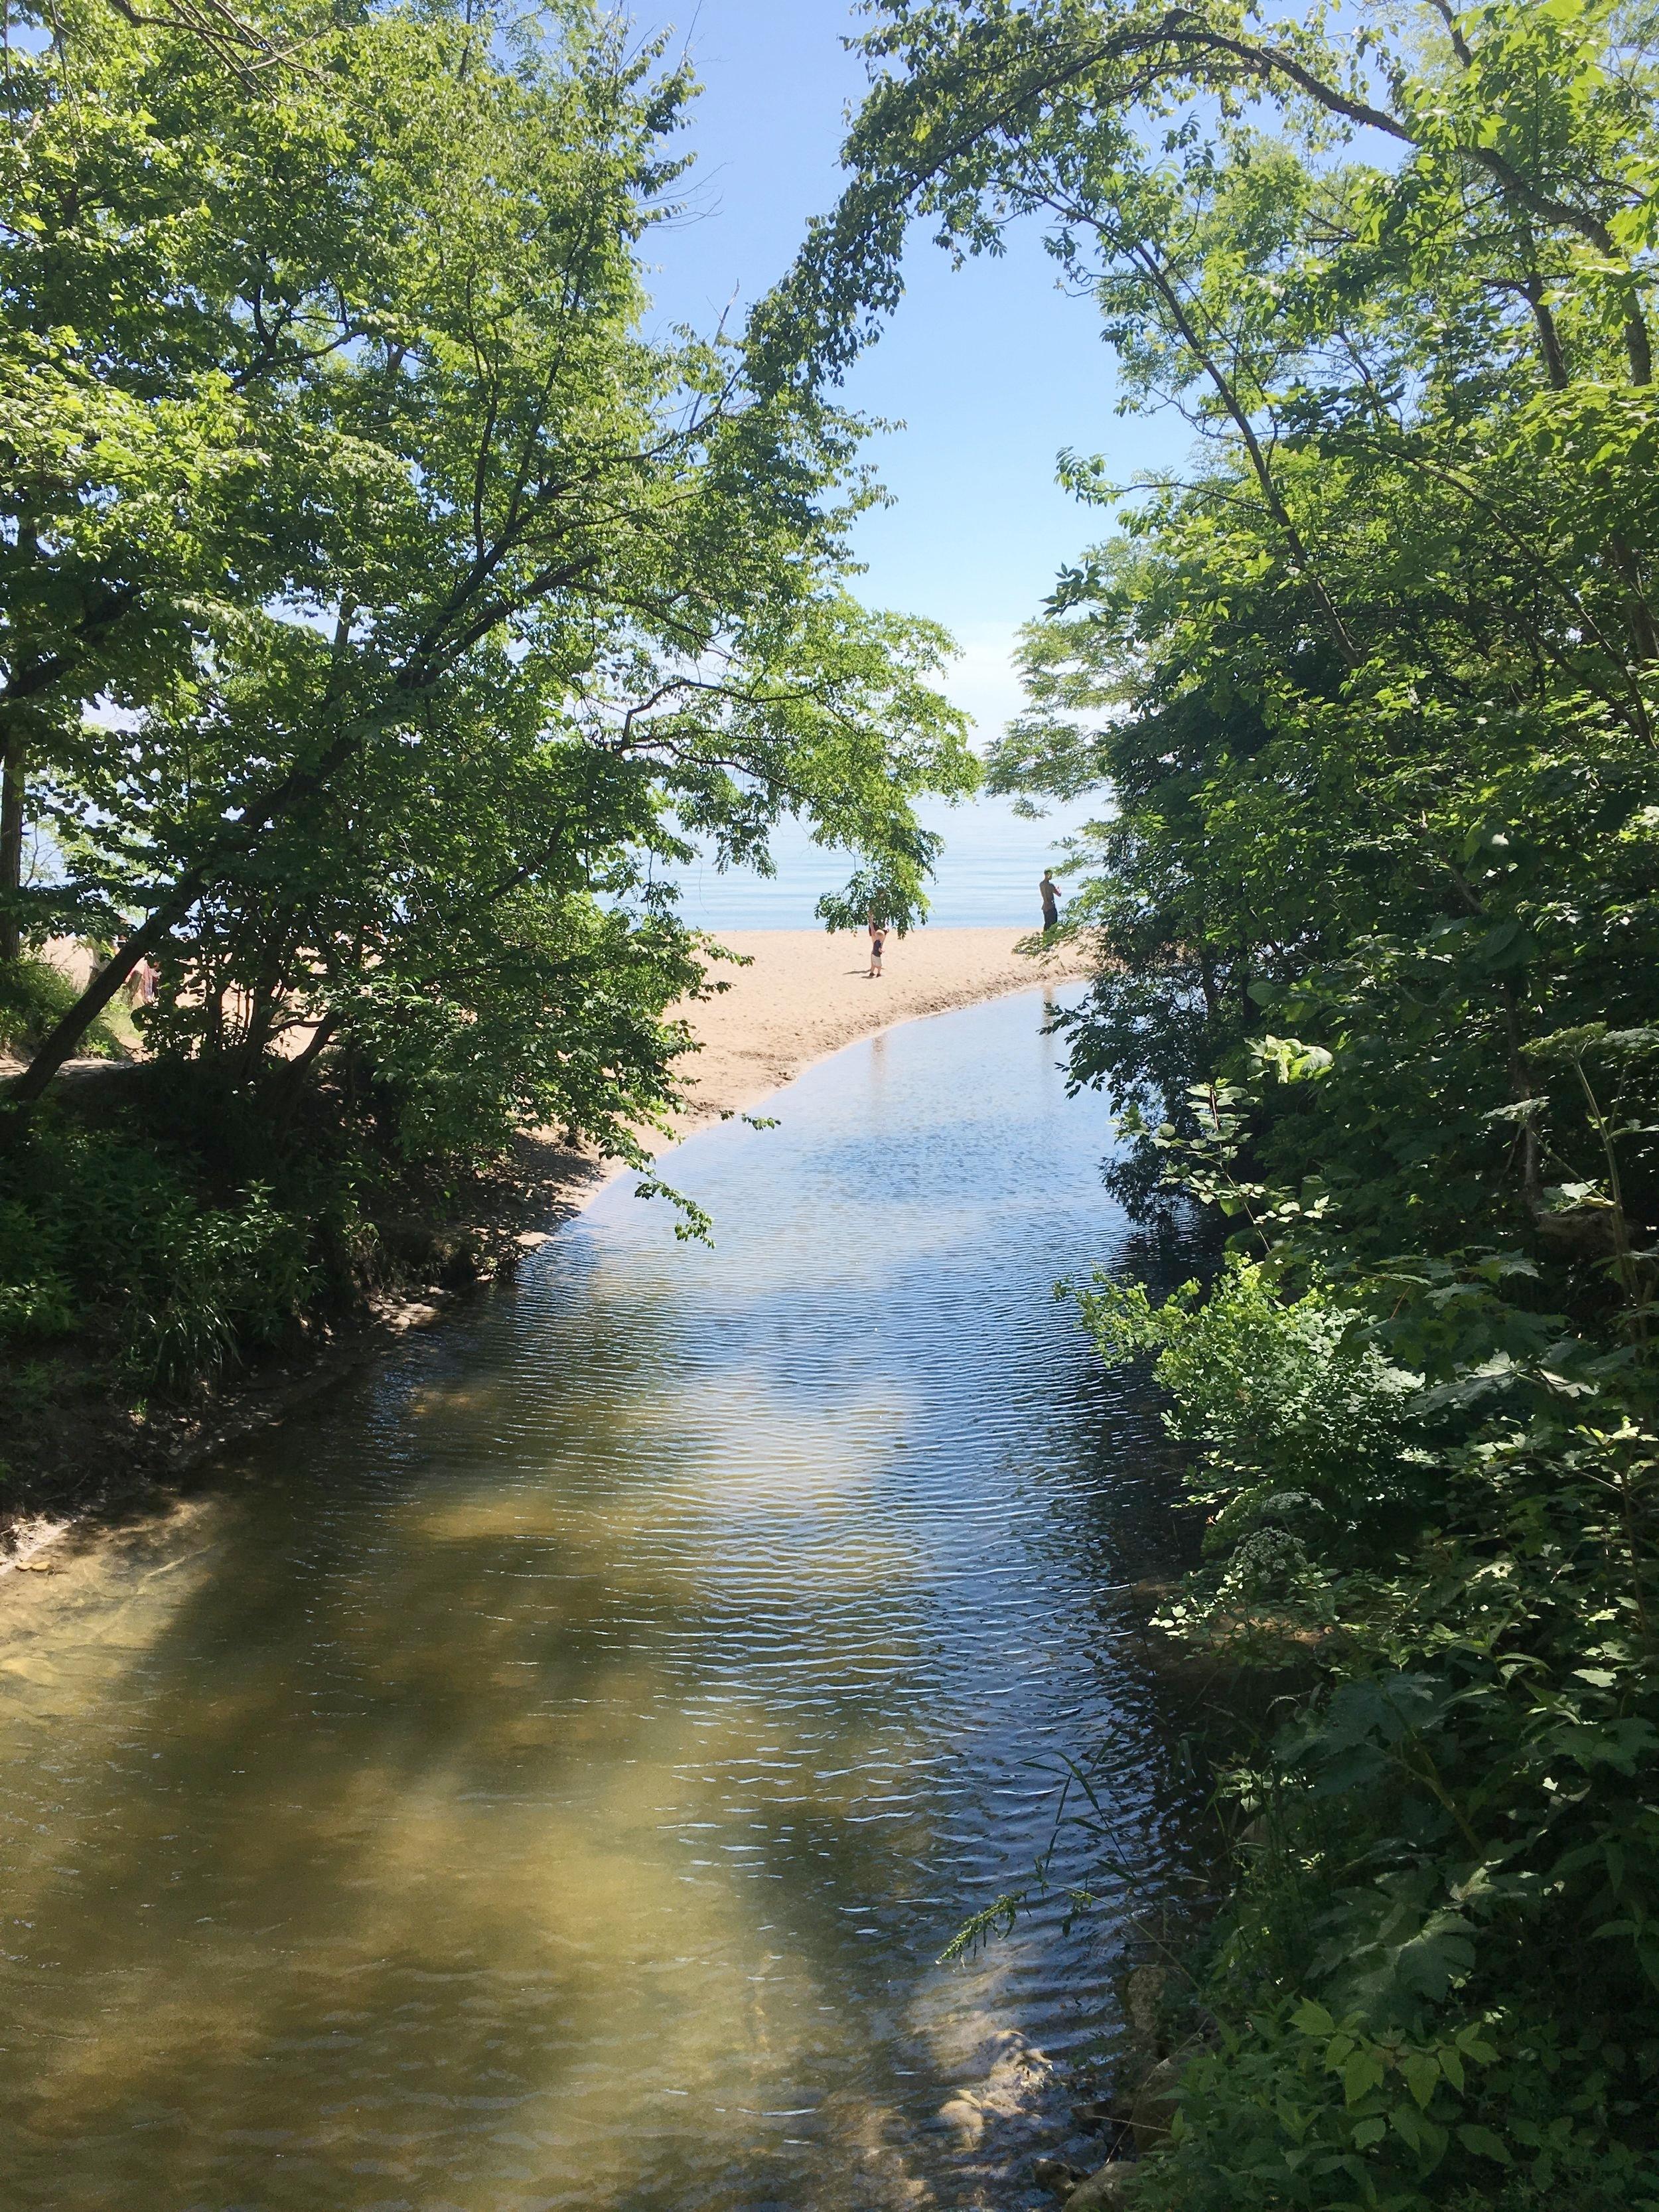 Hiking at Seven Bridges